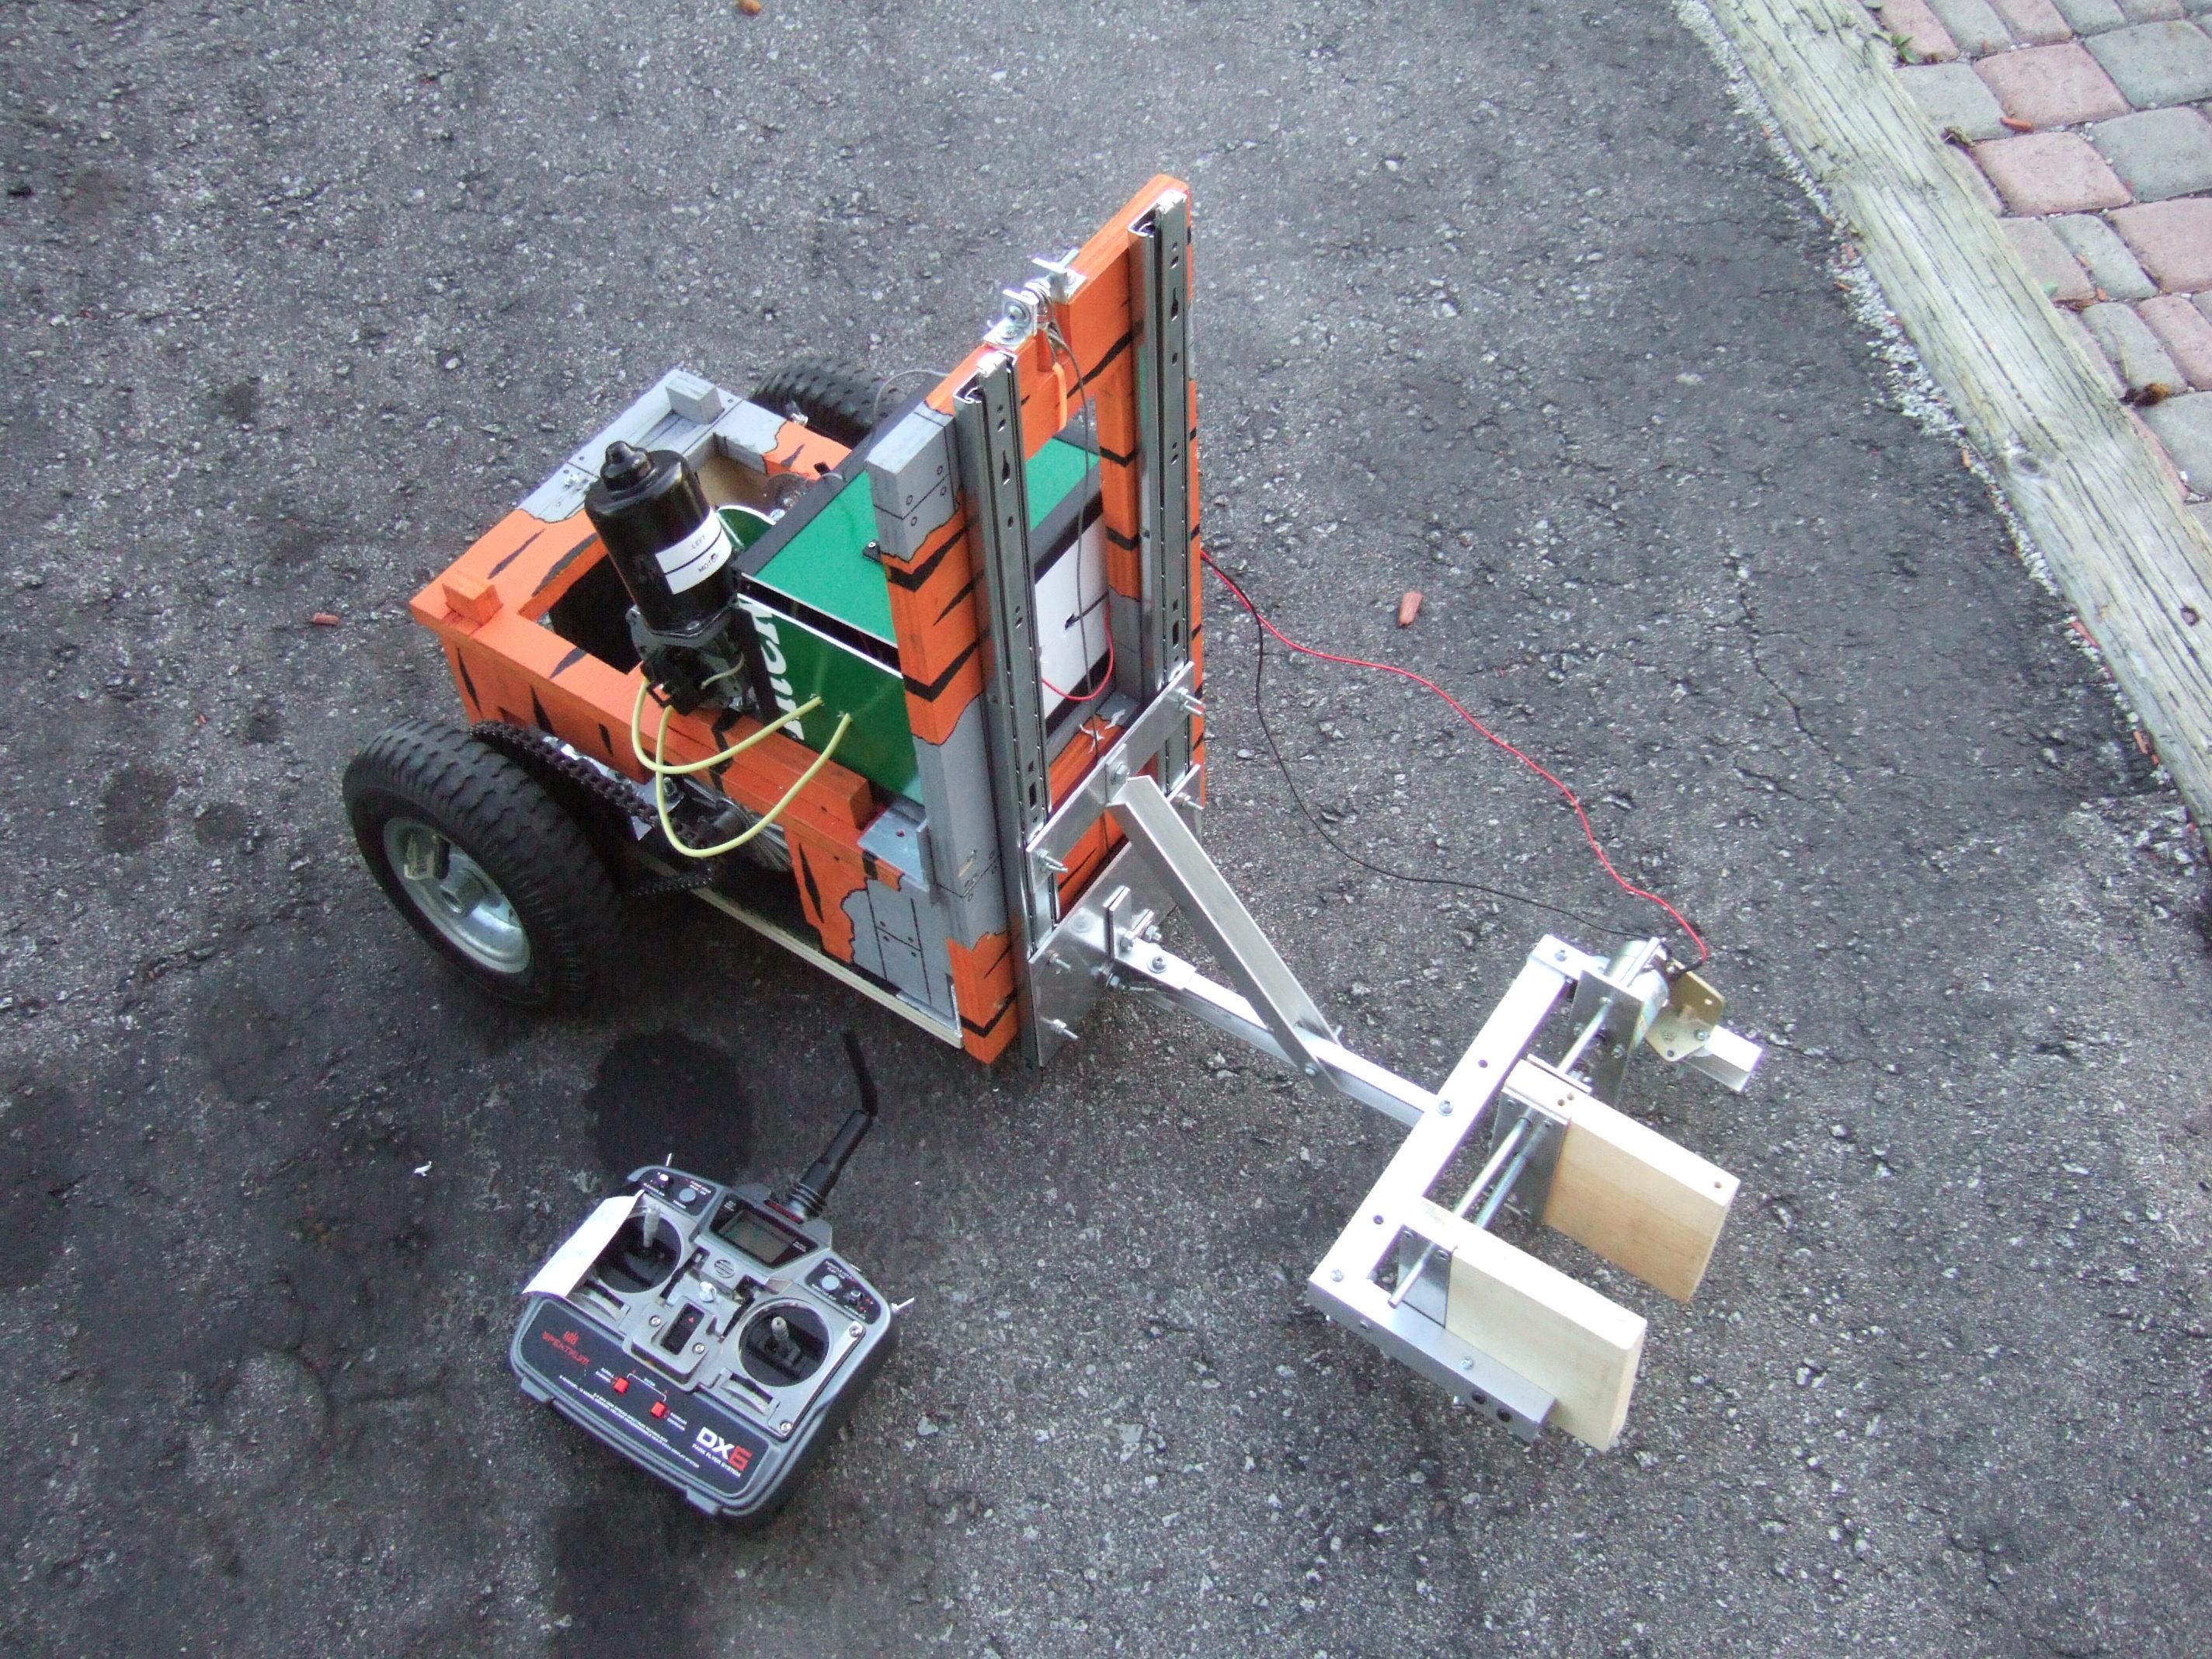 Picture of Tiger Forklift